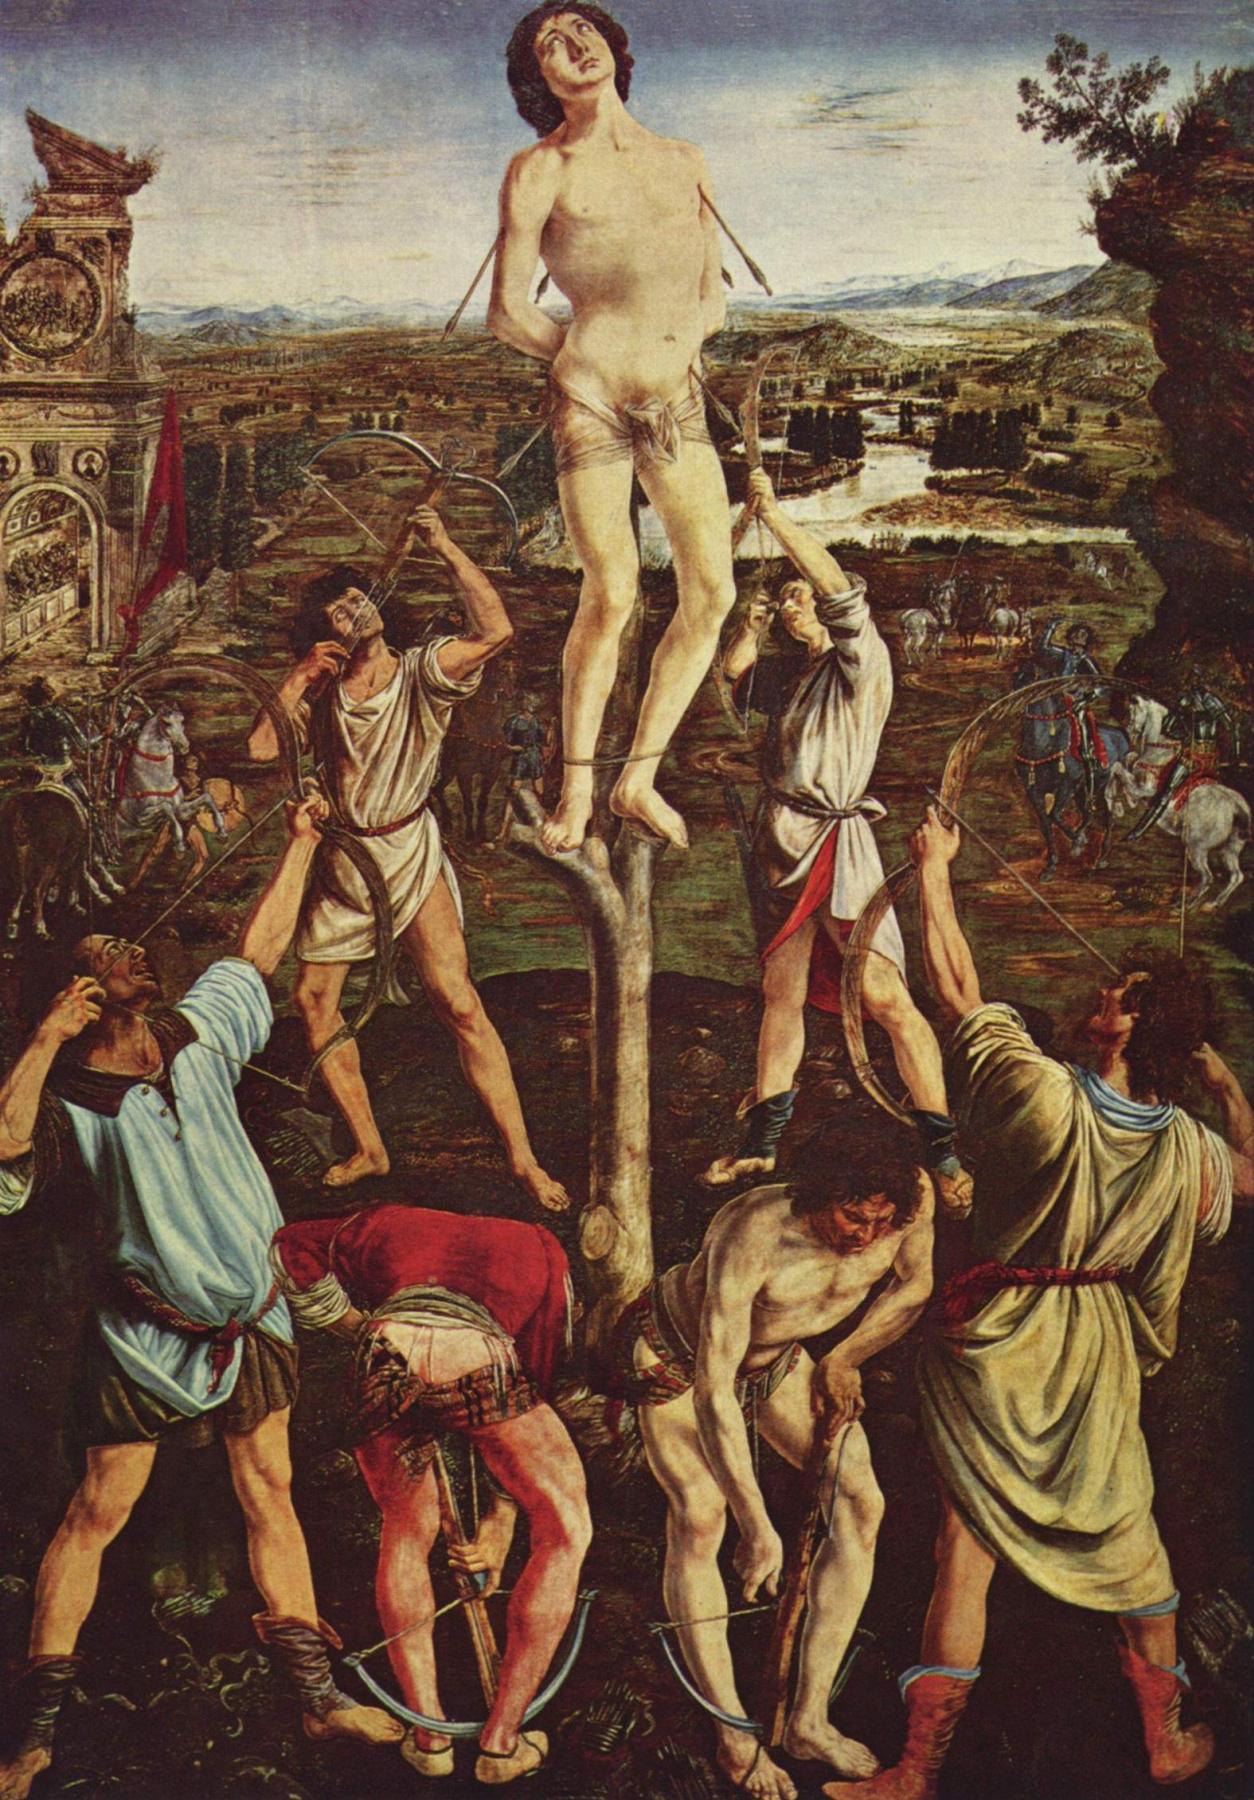 Antonio Pollaiolo. The martyrdom of St. Sebastian